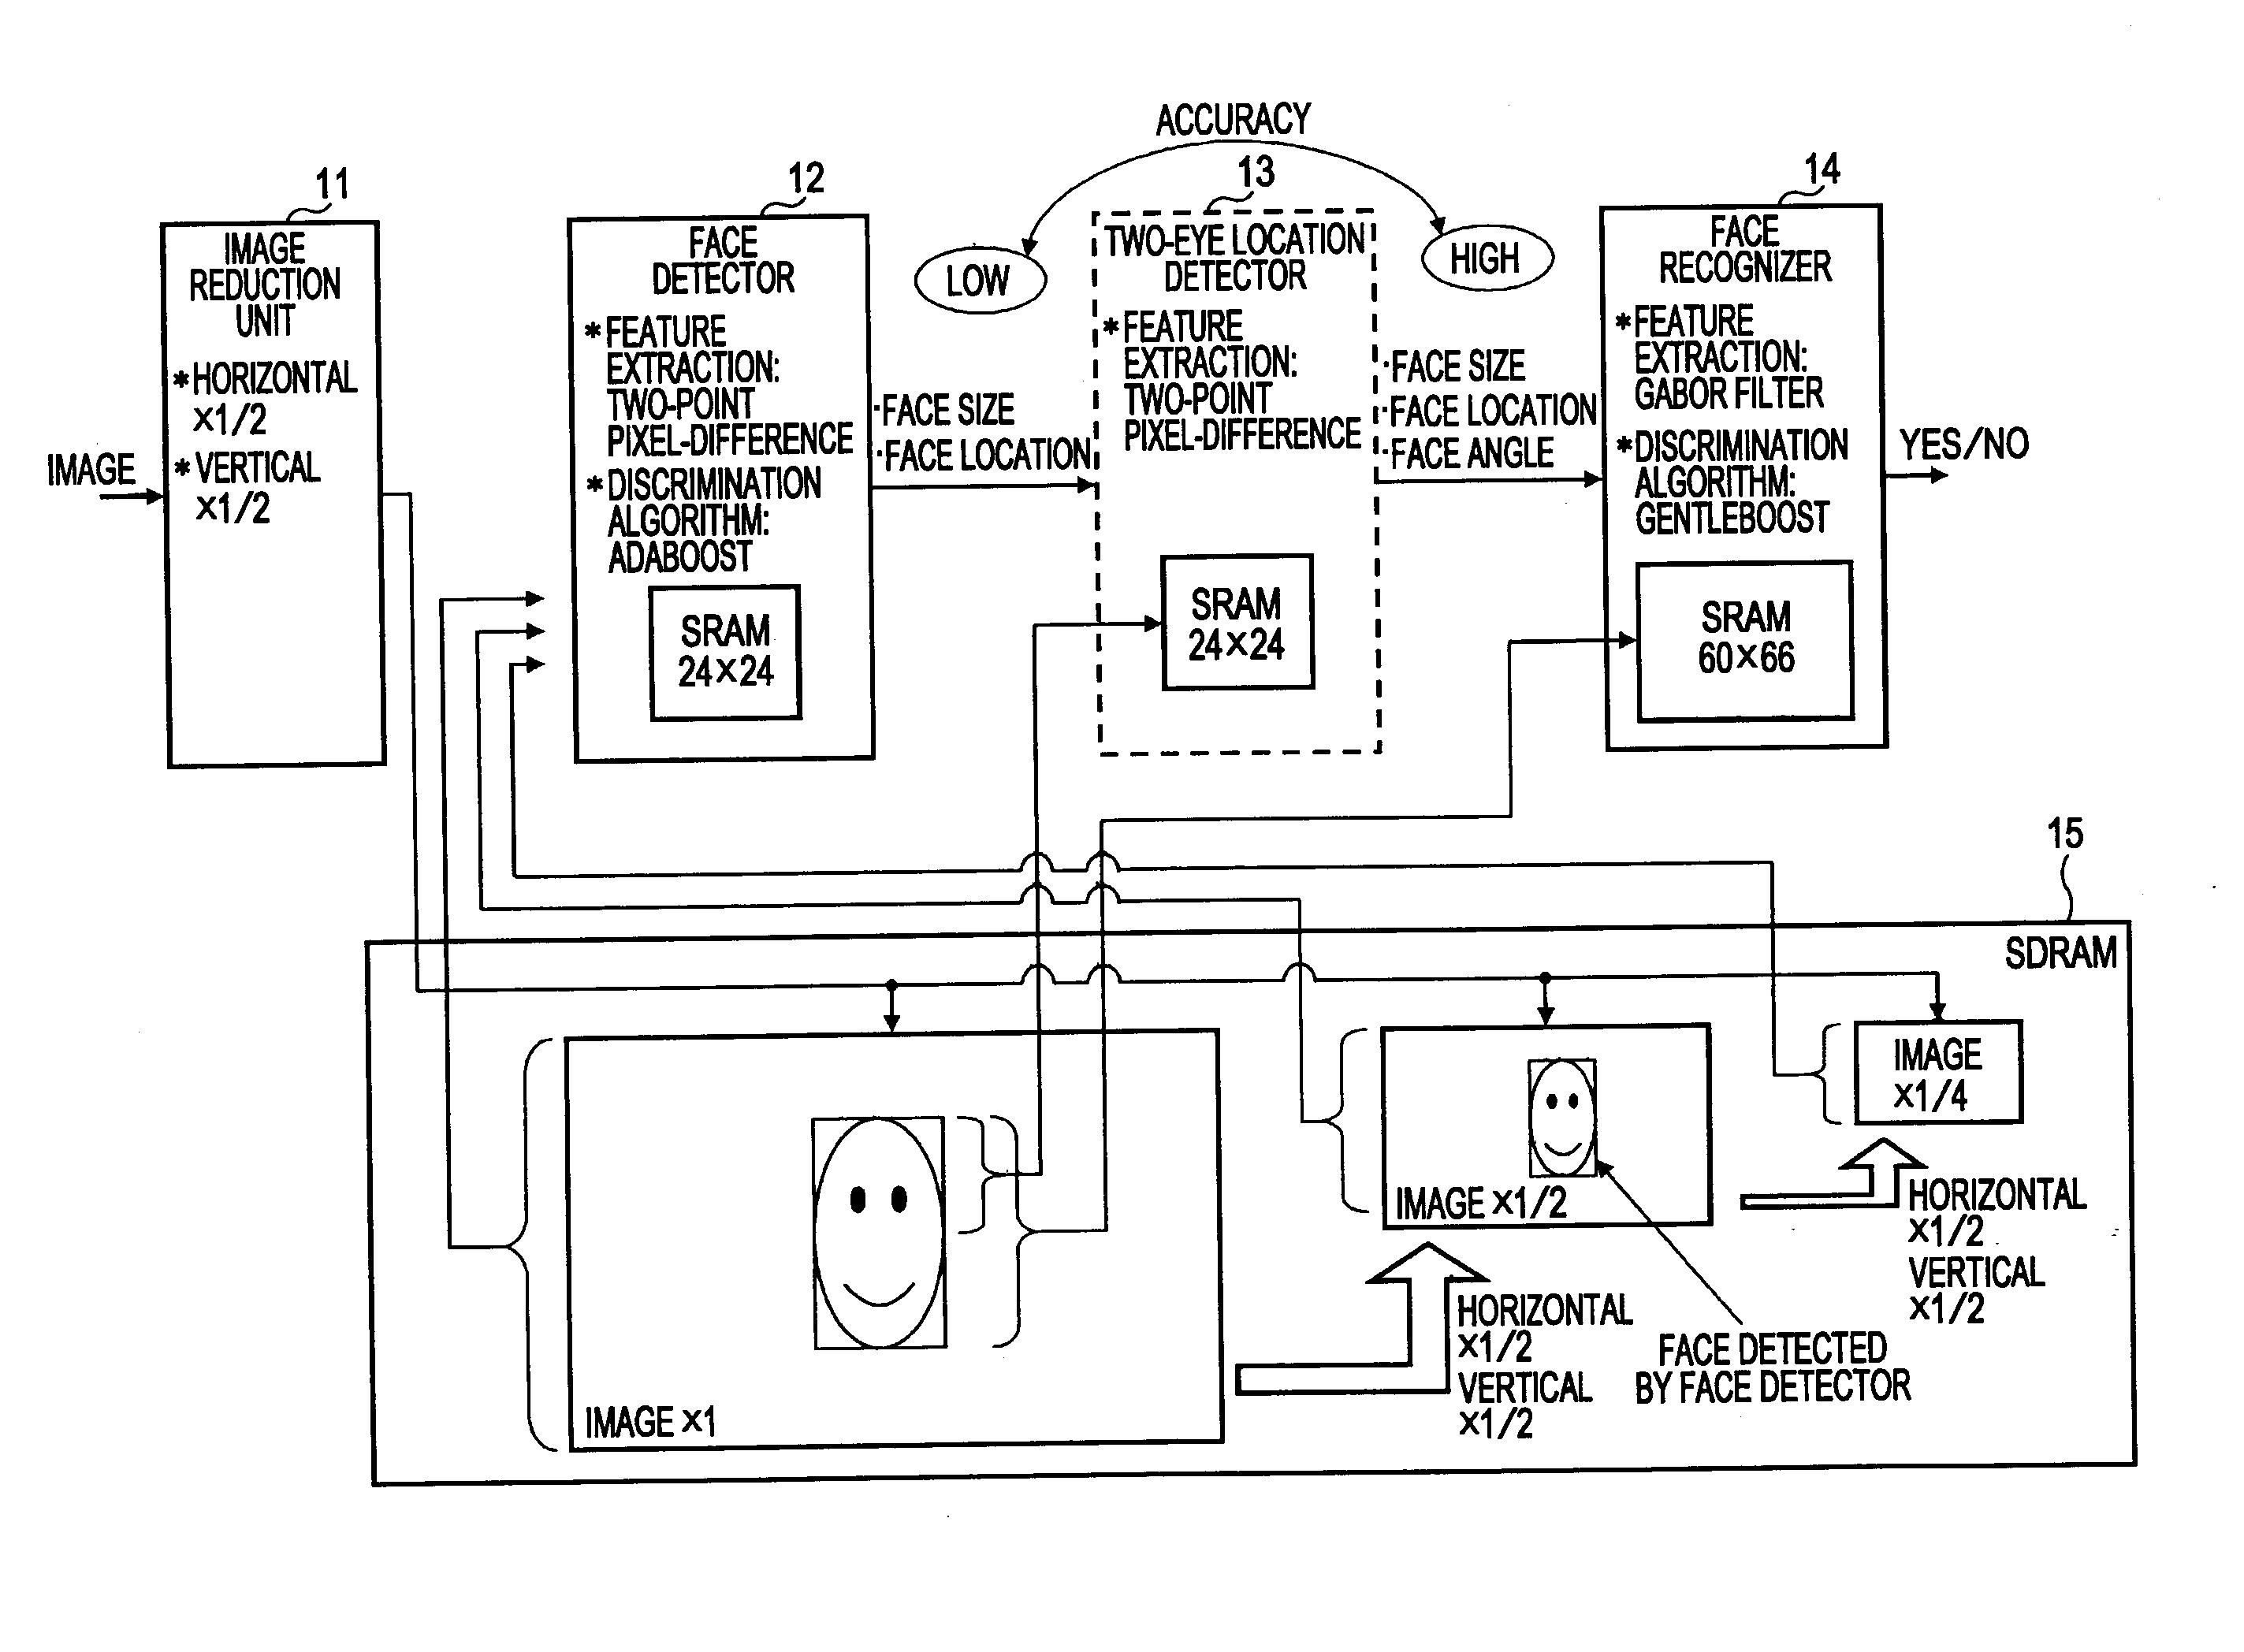 براءة الاختراع US20080144941 - Face recognition apparatus